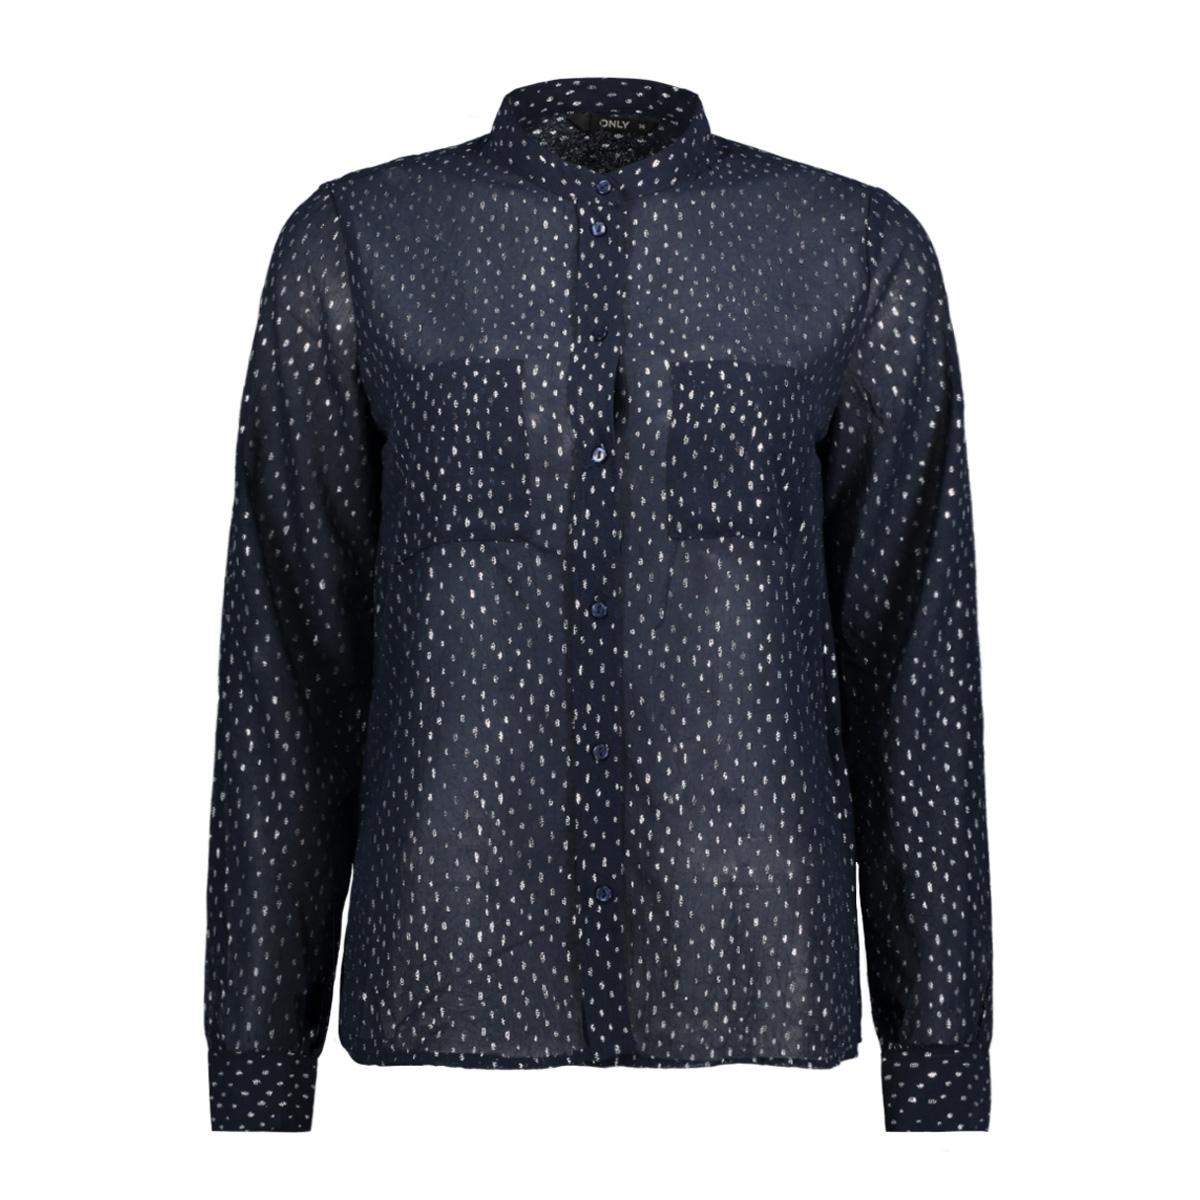 onlrosalyn l/s shirt wvn 15146997 only blouse night sky/silver foi